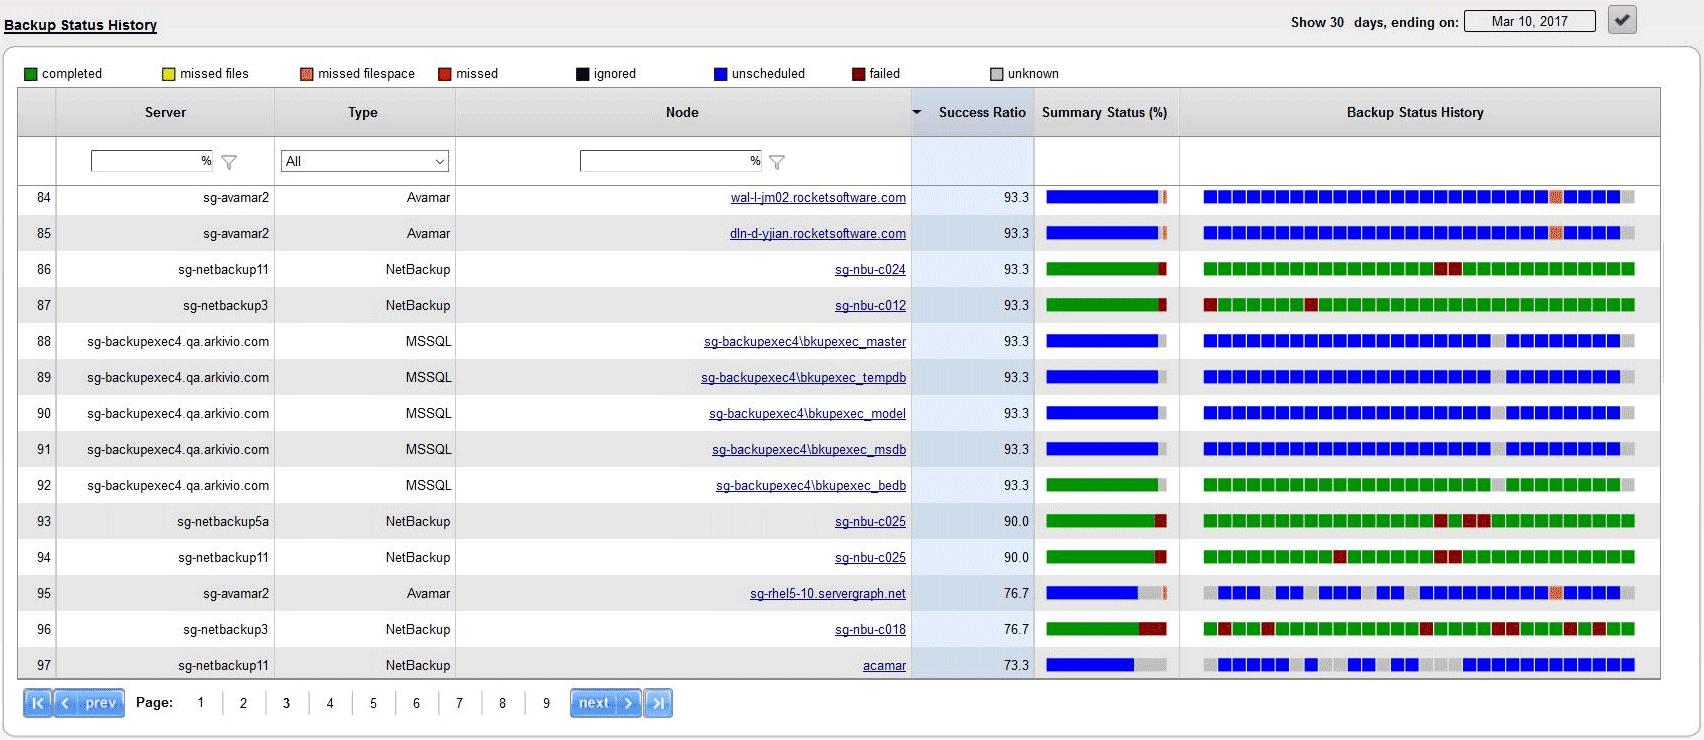 Backup Status History